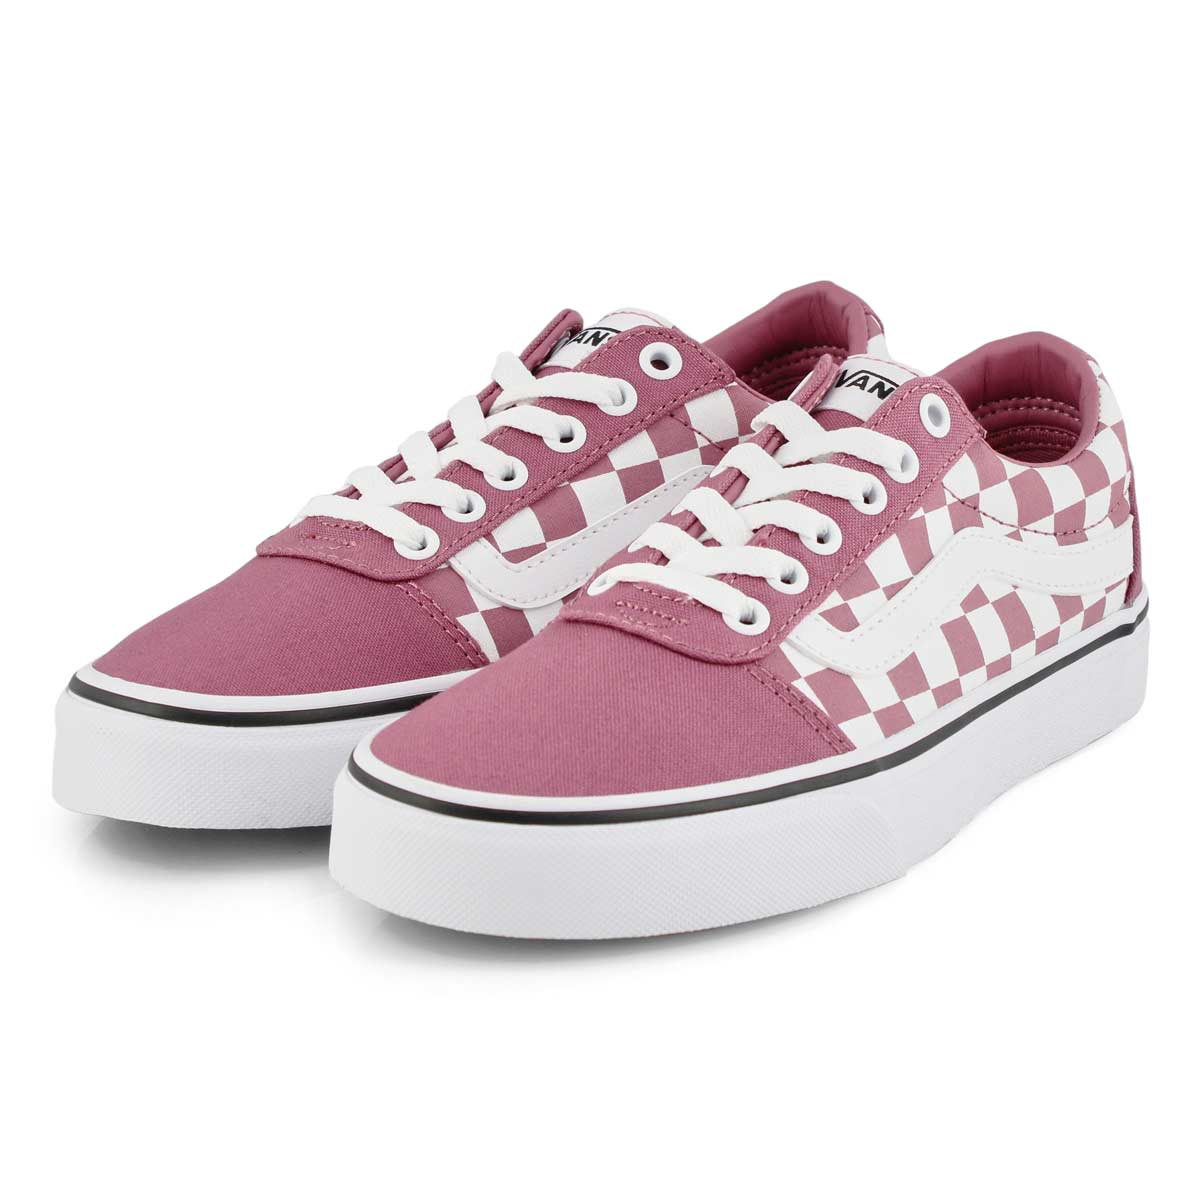 Women's Ward Sneaker - Checkered Rose/White